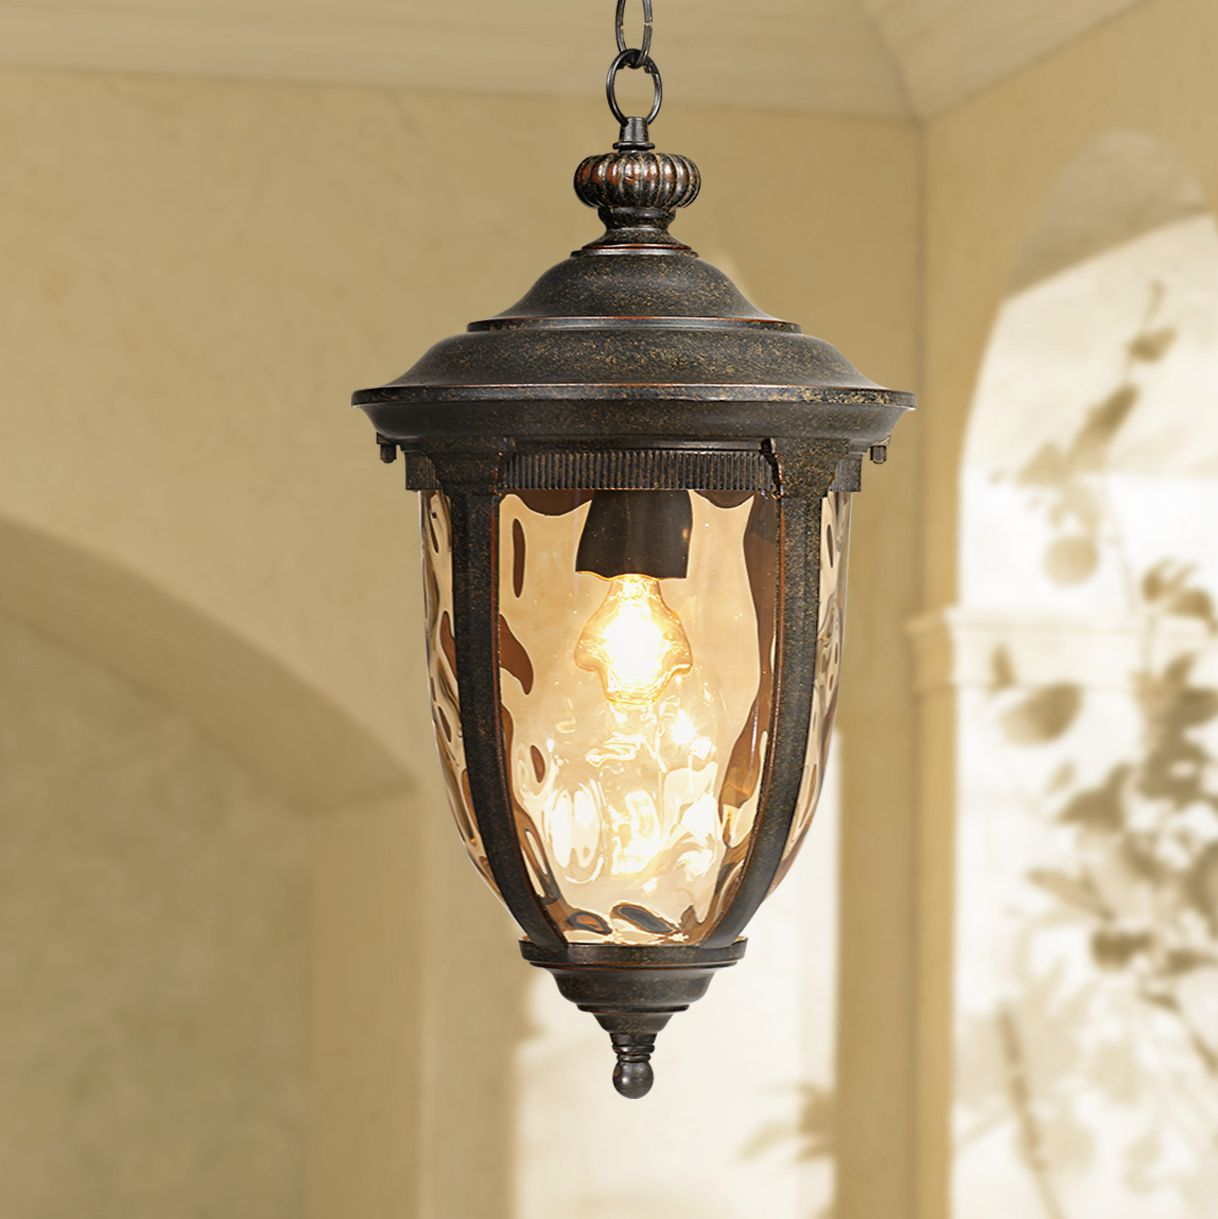 john timberland rustic outdoor ceiling light bronze 18 hammered glass for exterior entryway proch walmart com